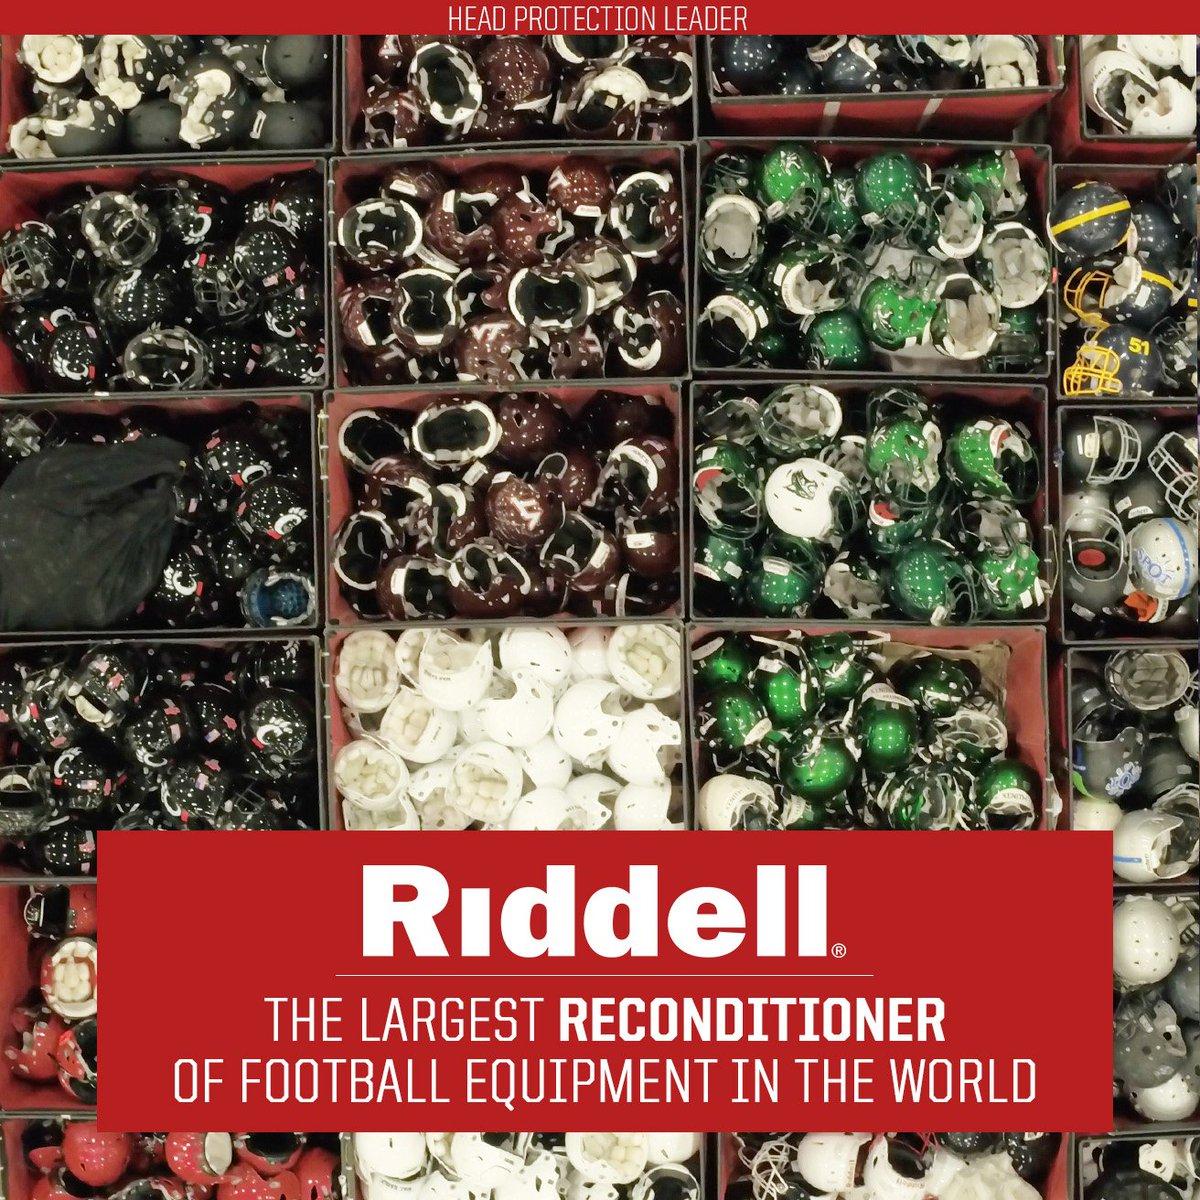 Riddell Sports's photo on #wednesdaywisdom